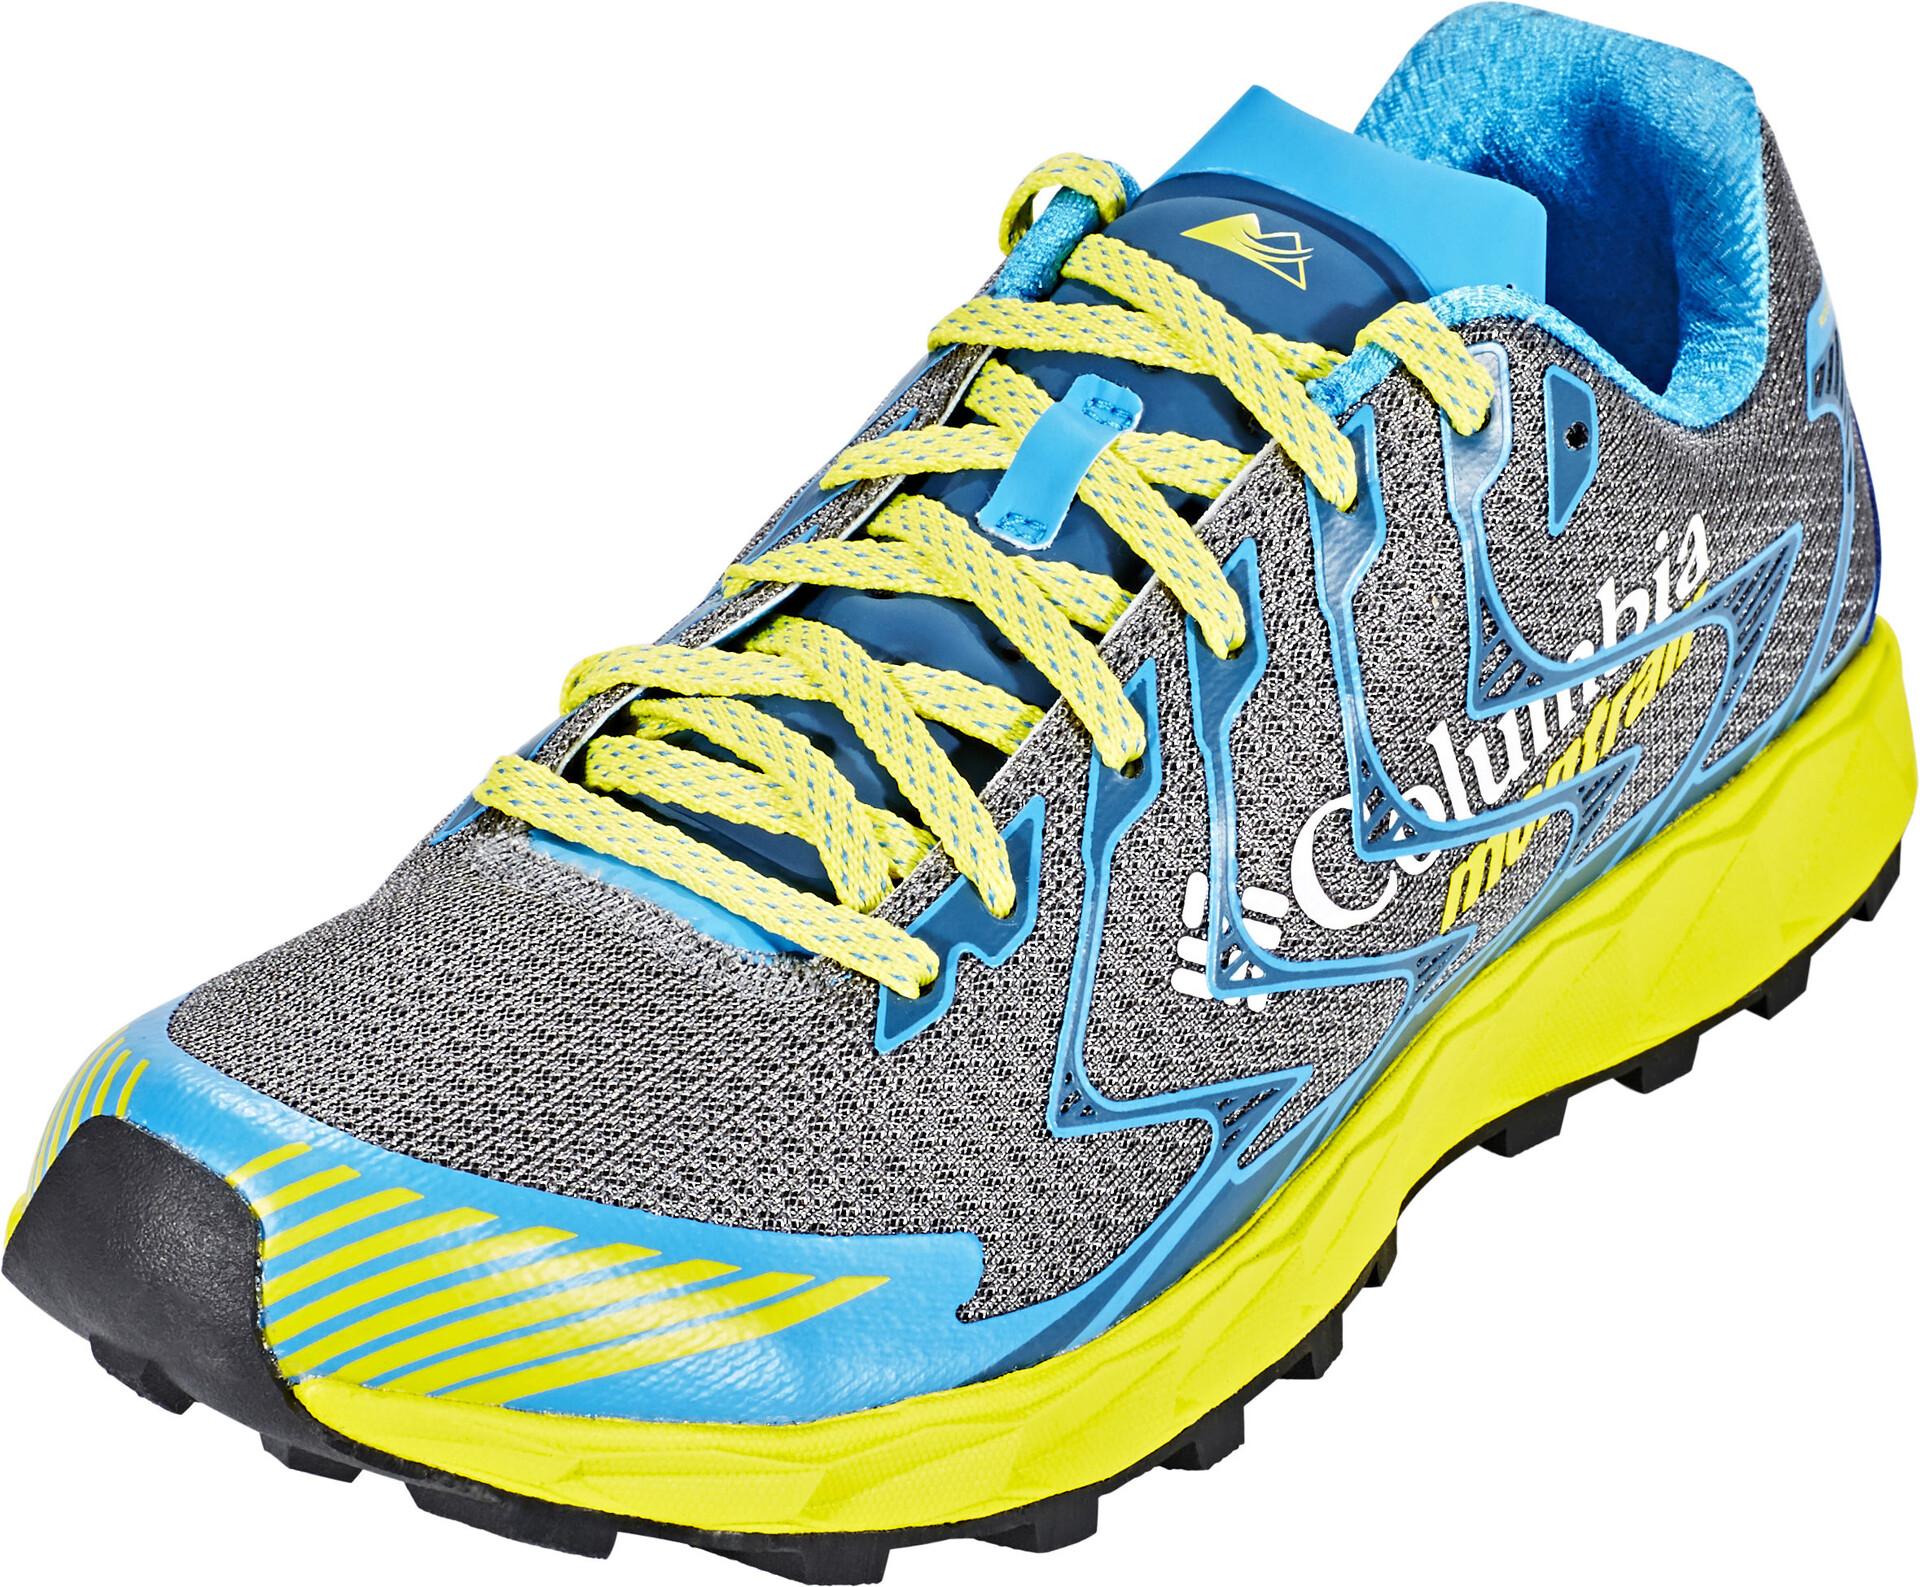 Columbia Rogue F.K.T Hommes Trail Running Shoe (jaunegris